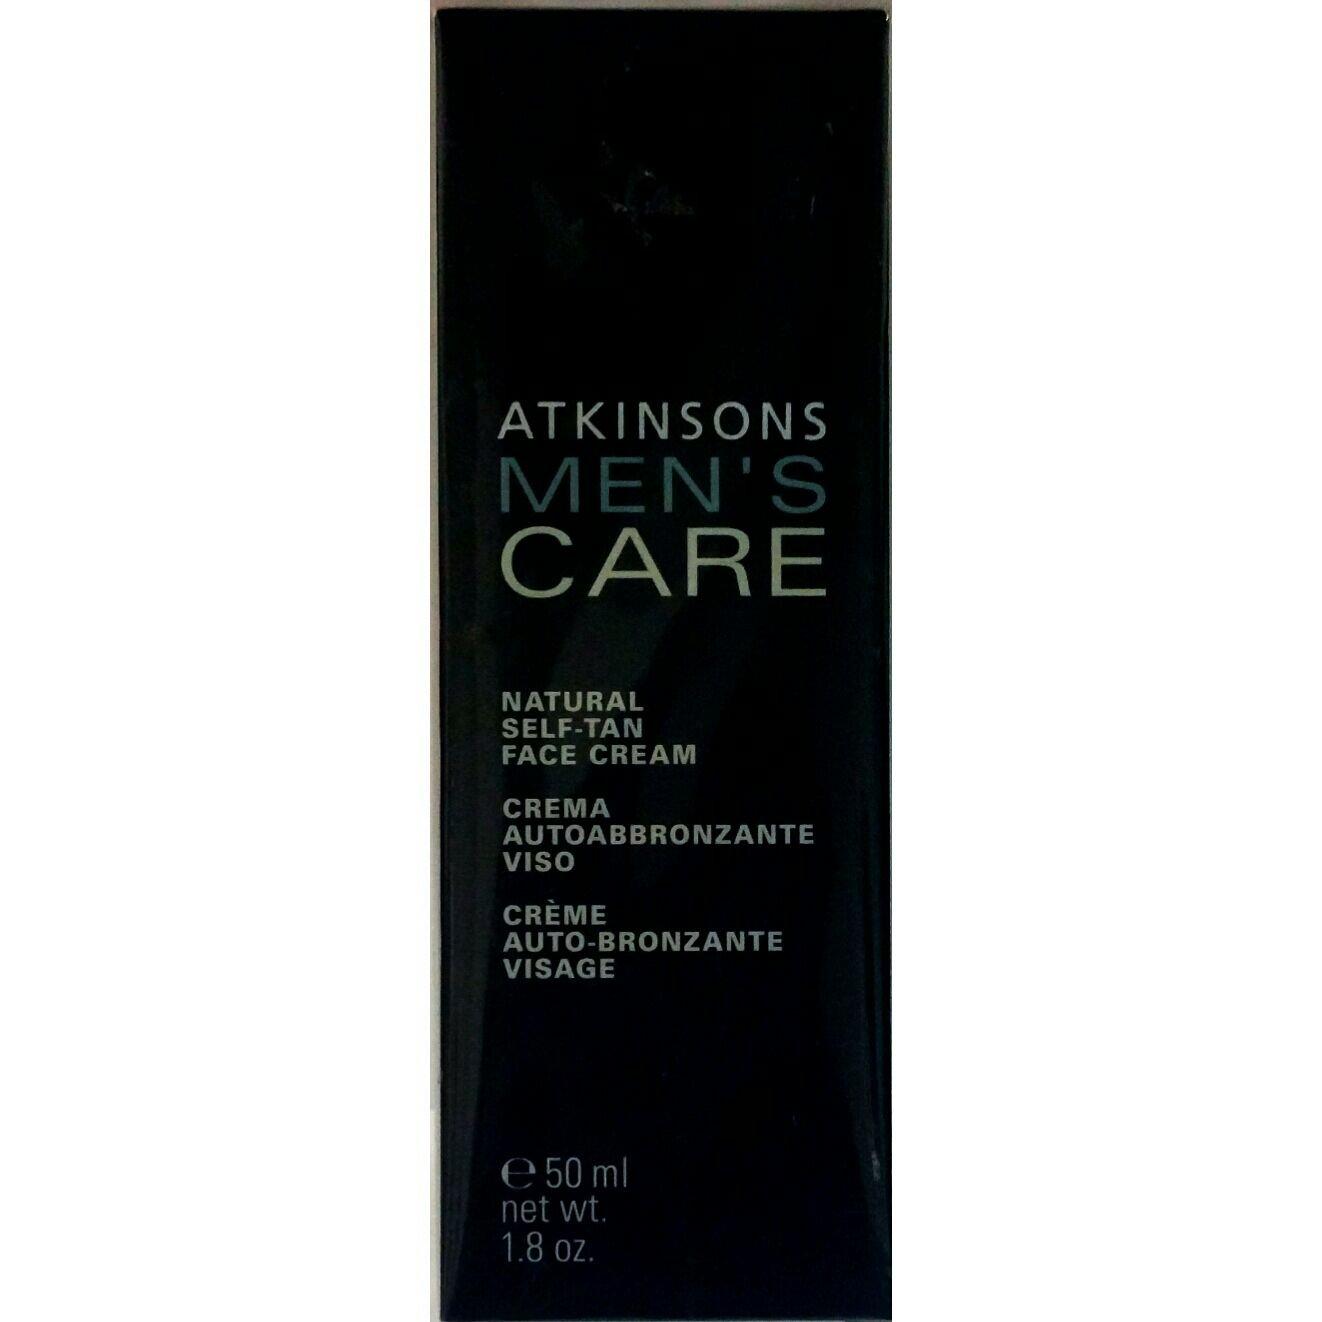 Atkinsons Men's Care Crema Autoabbronzante Viso 50 ml